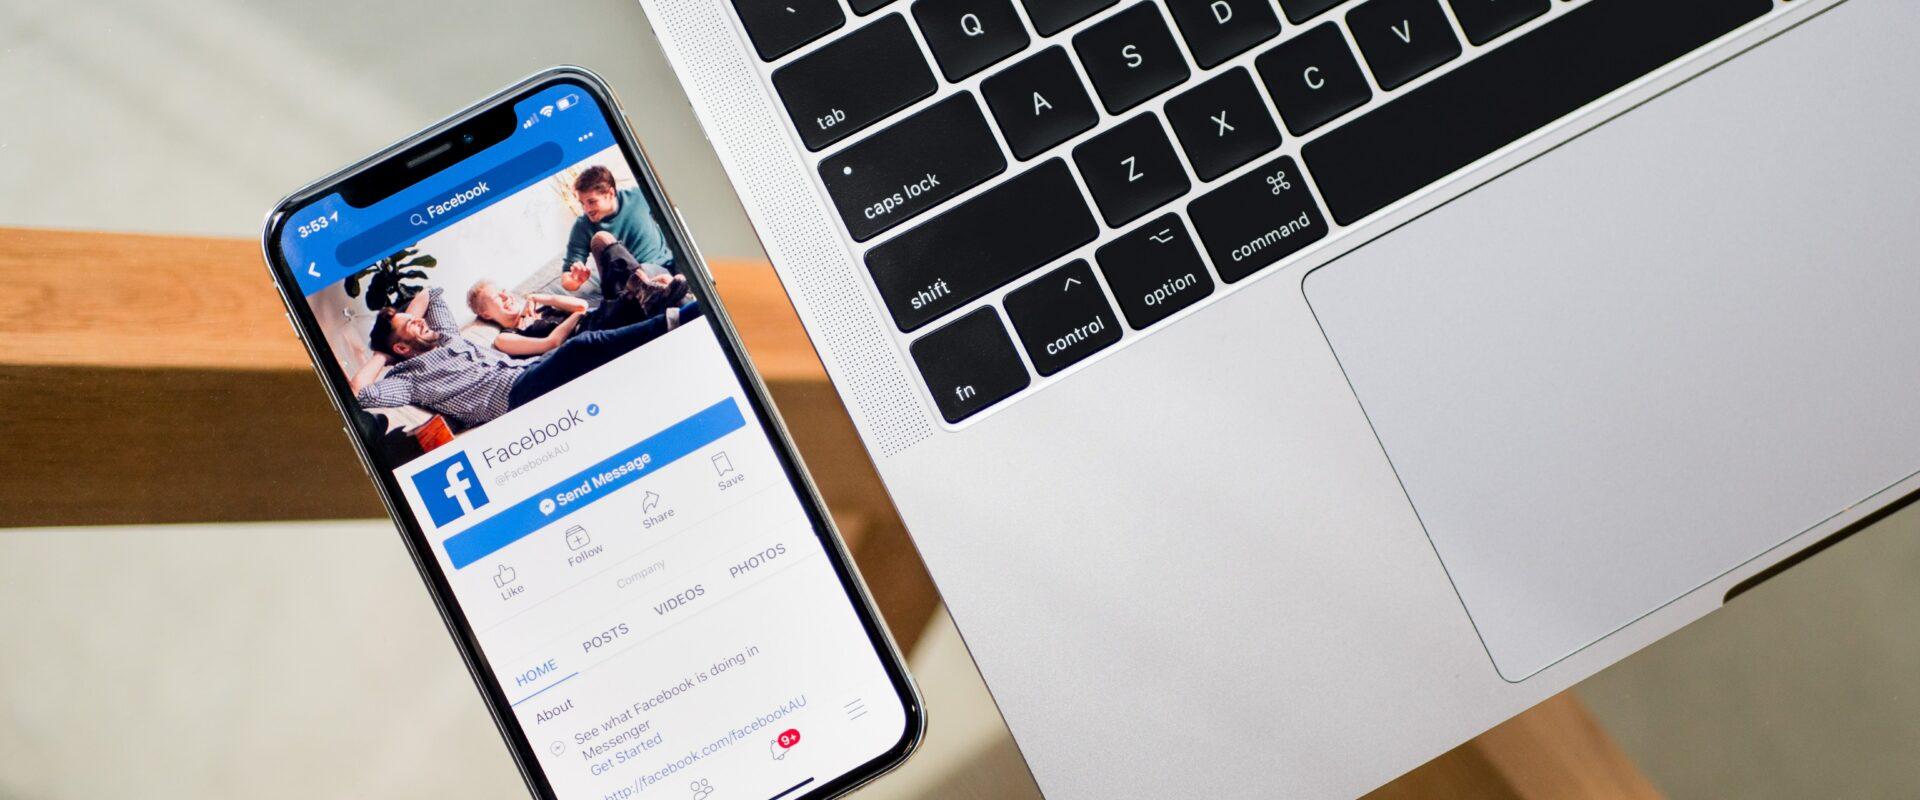 Facebook en laptop